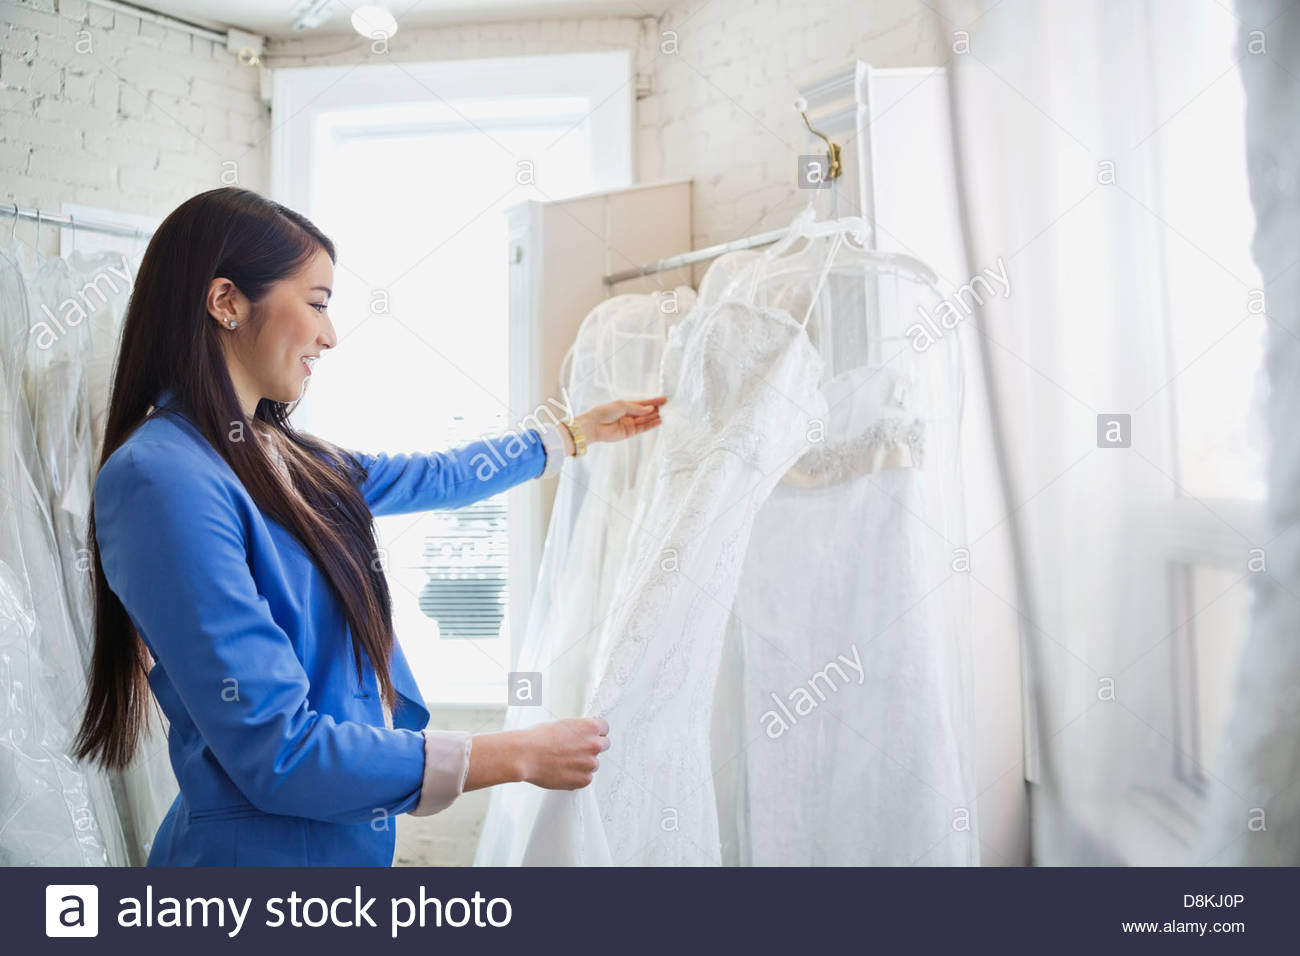 Casual Dress Stockfotos & Casual Dress Bilder - Alamy